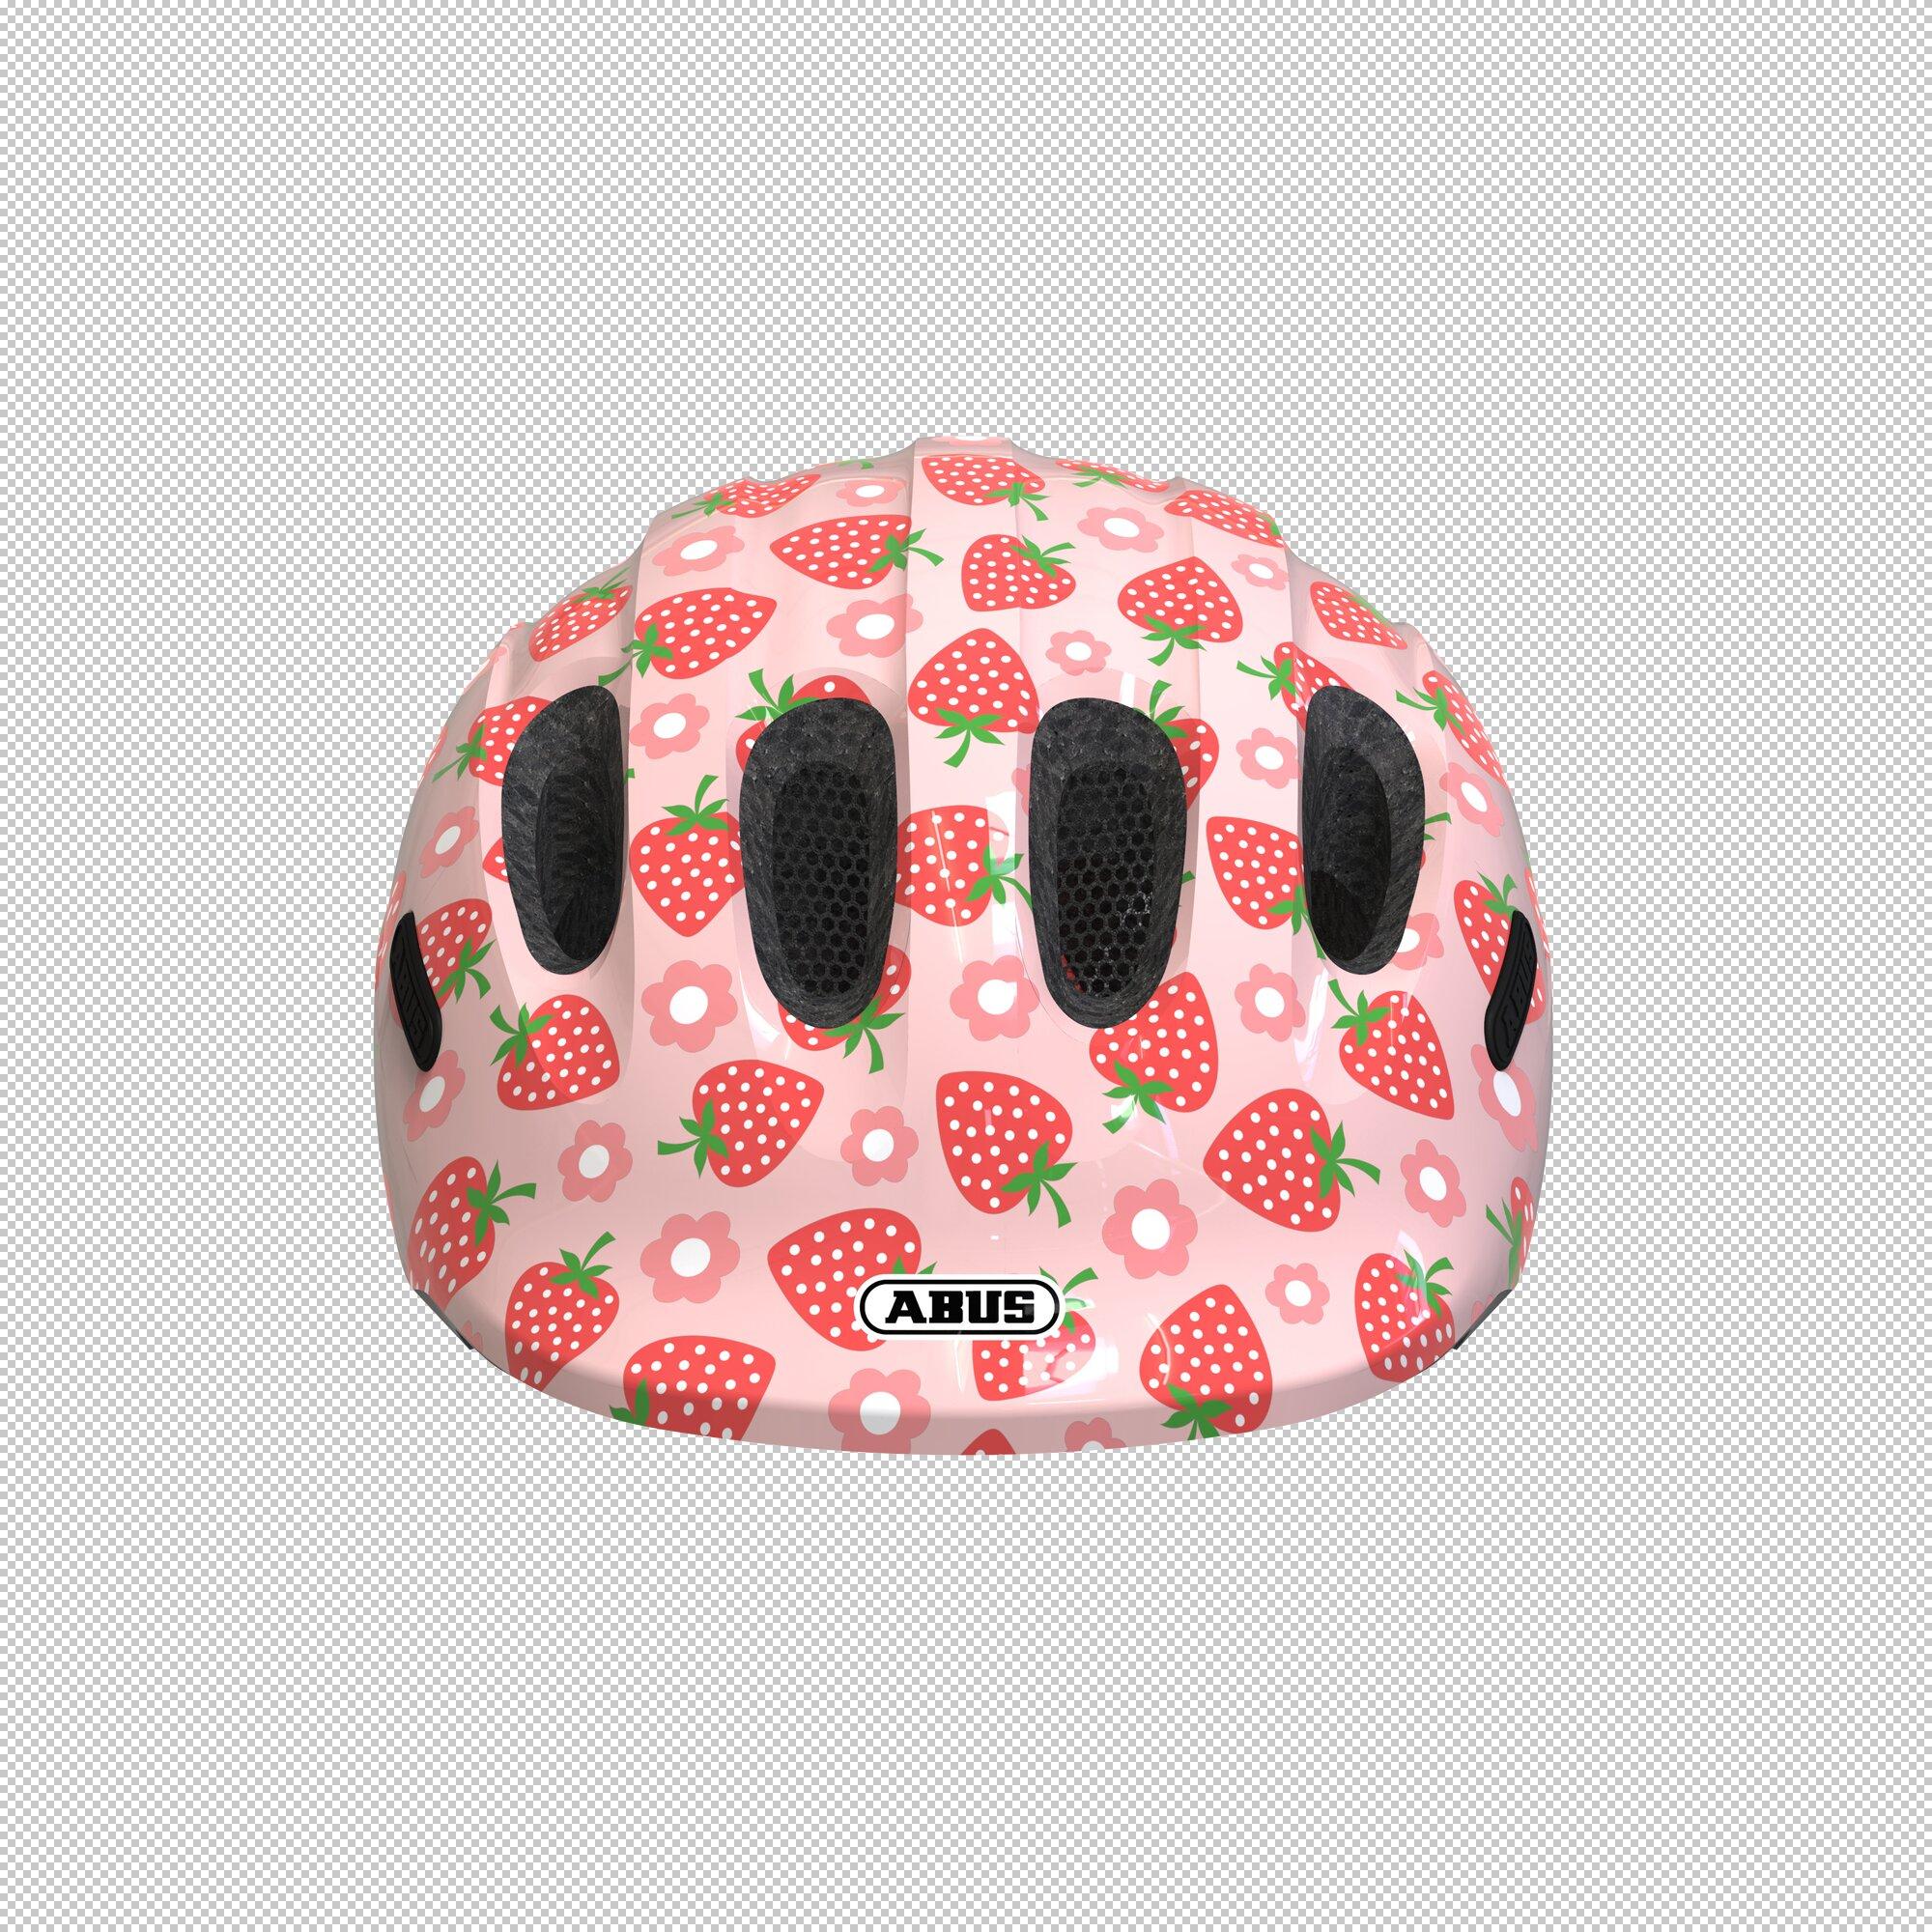 abus-fahrradhelm-smiley-2-1